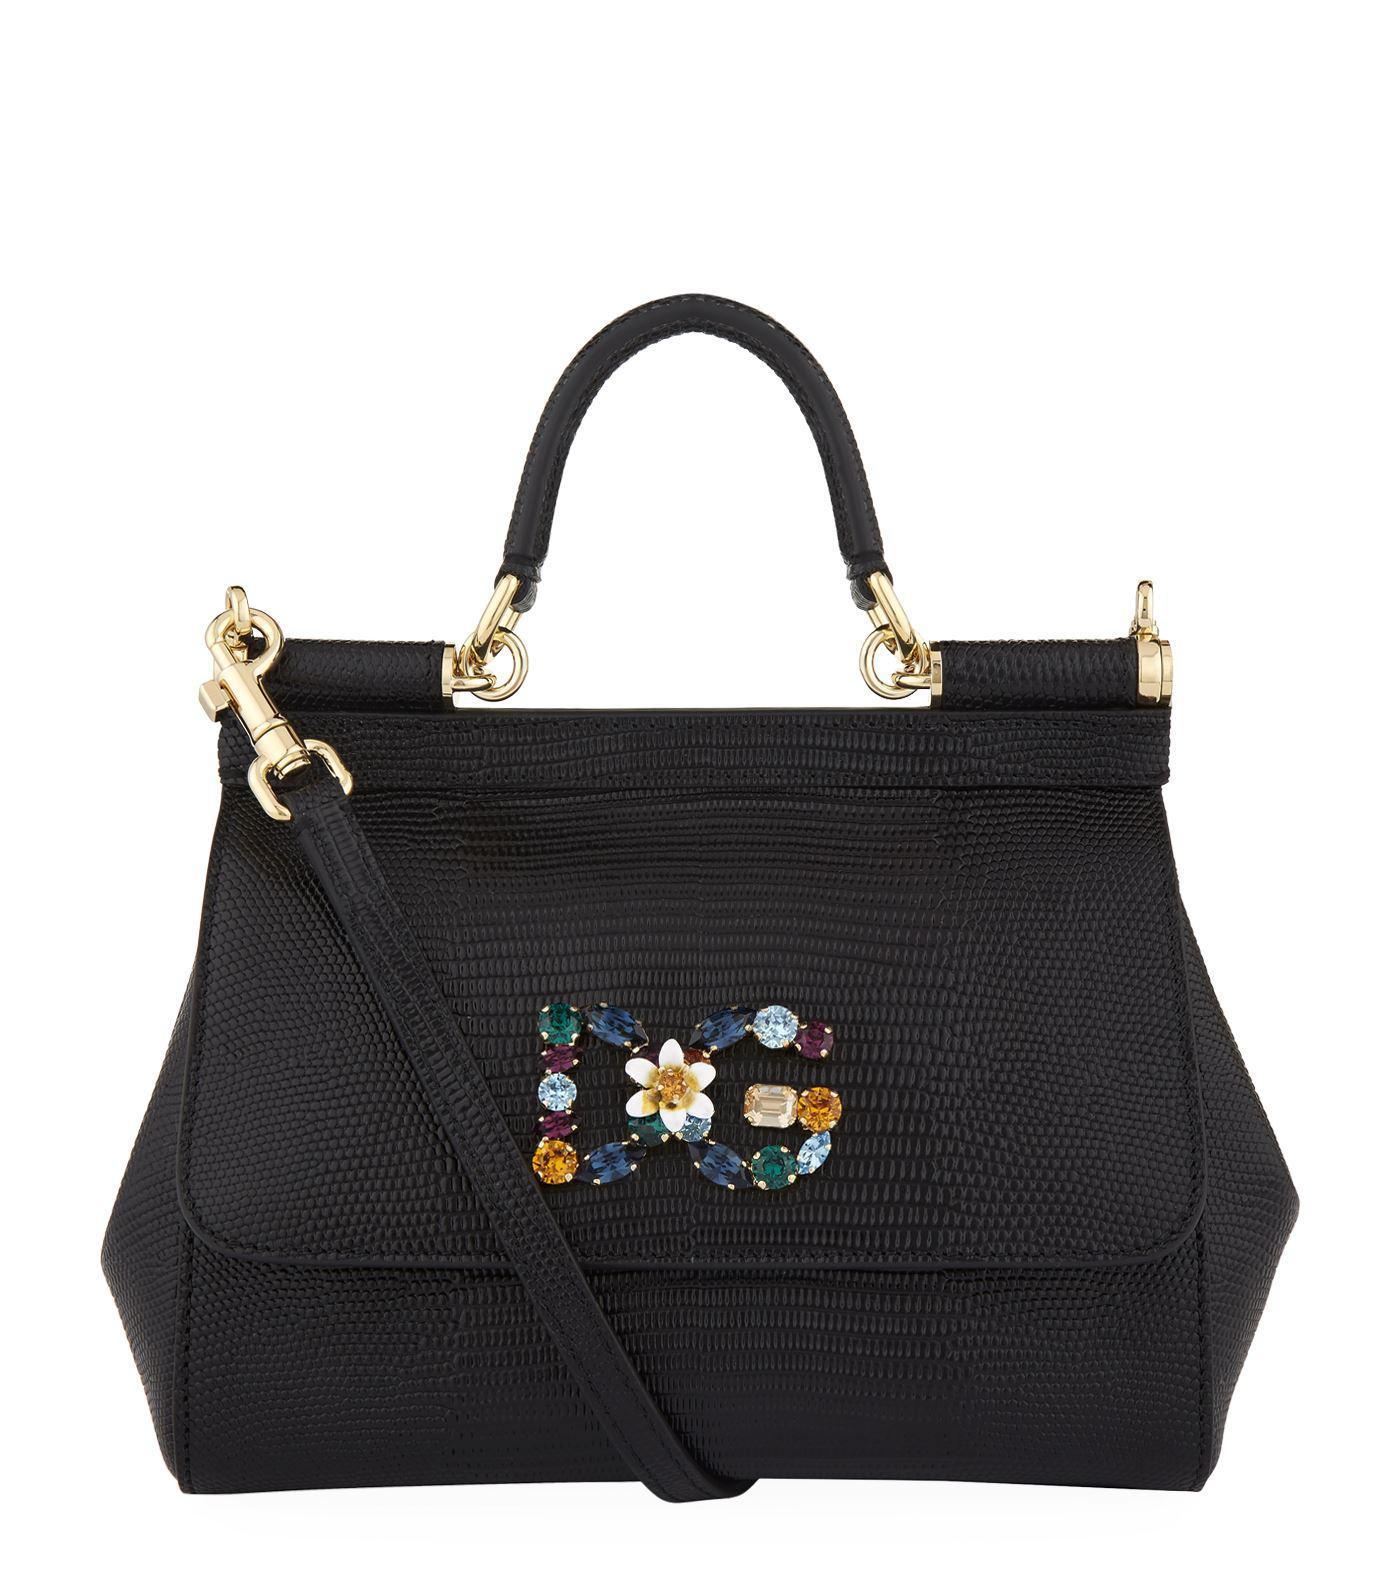 a98c47ffe7f6 Dolce   Gabbana Mini Embellished Sicily Bag in Black - Lyst